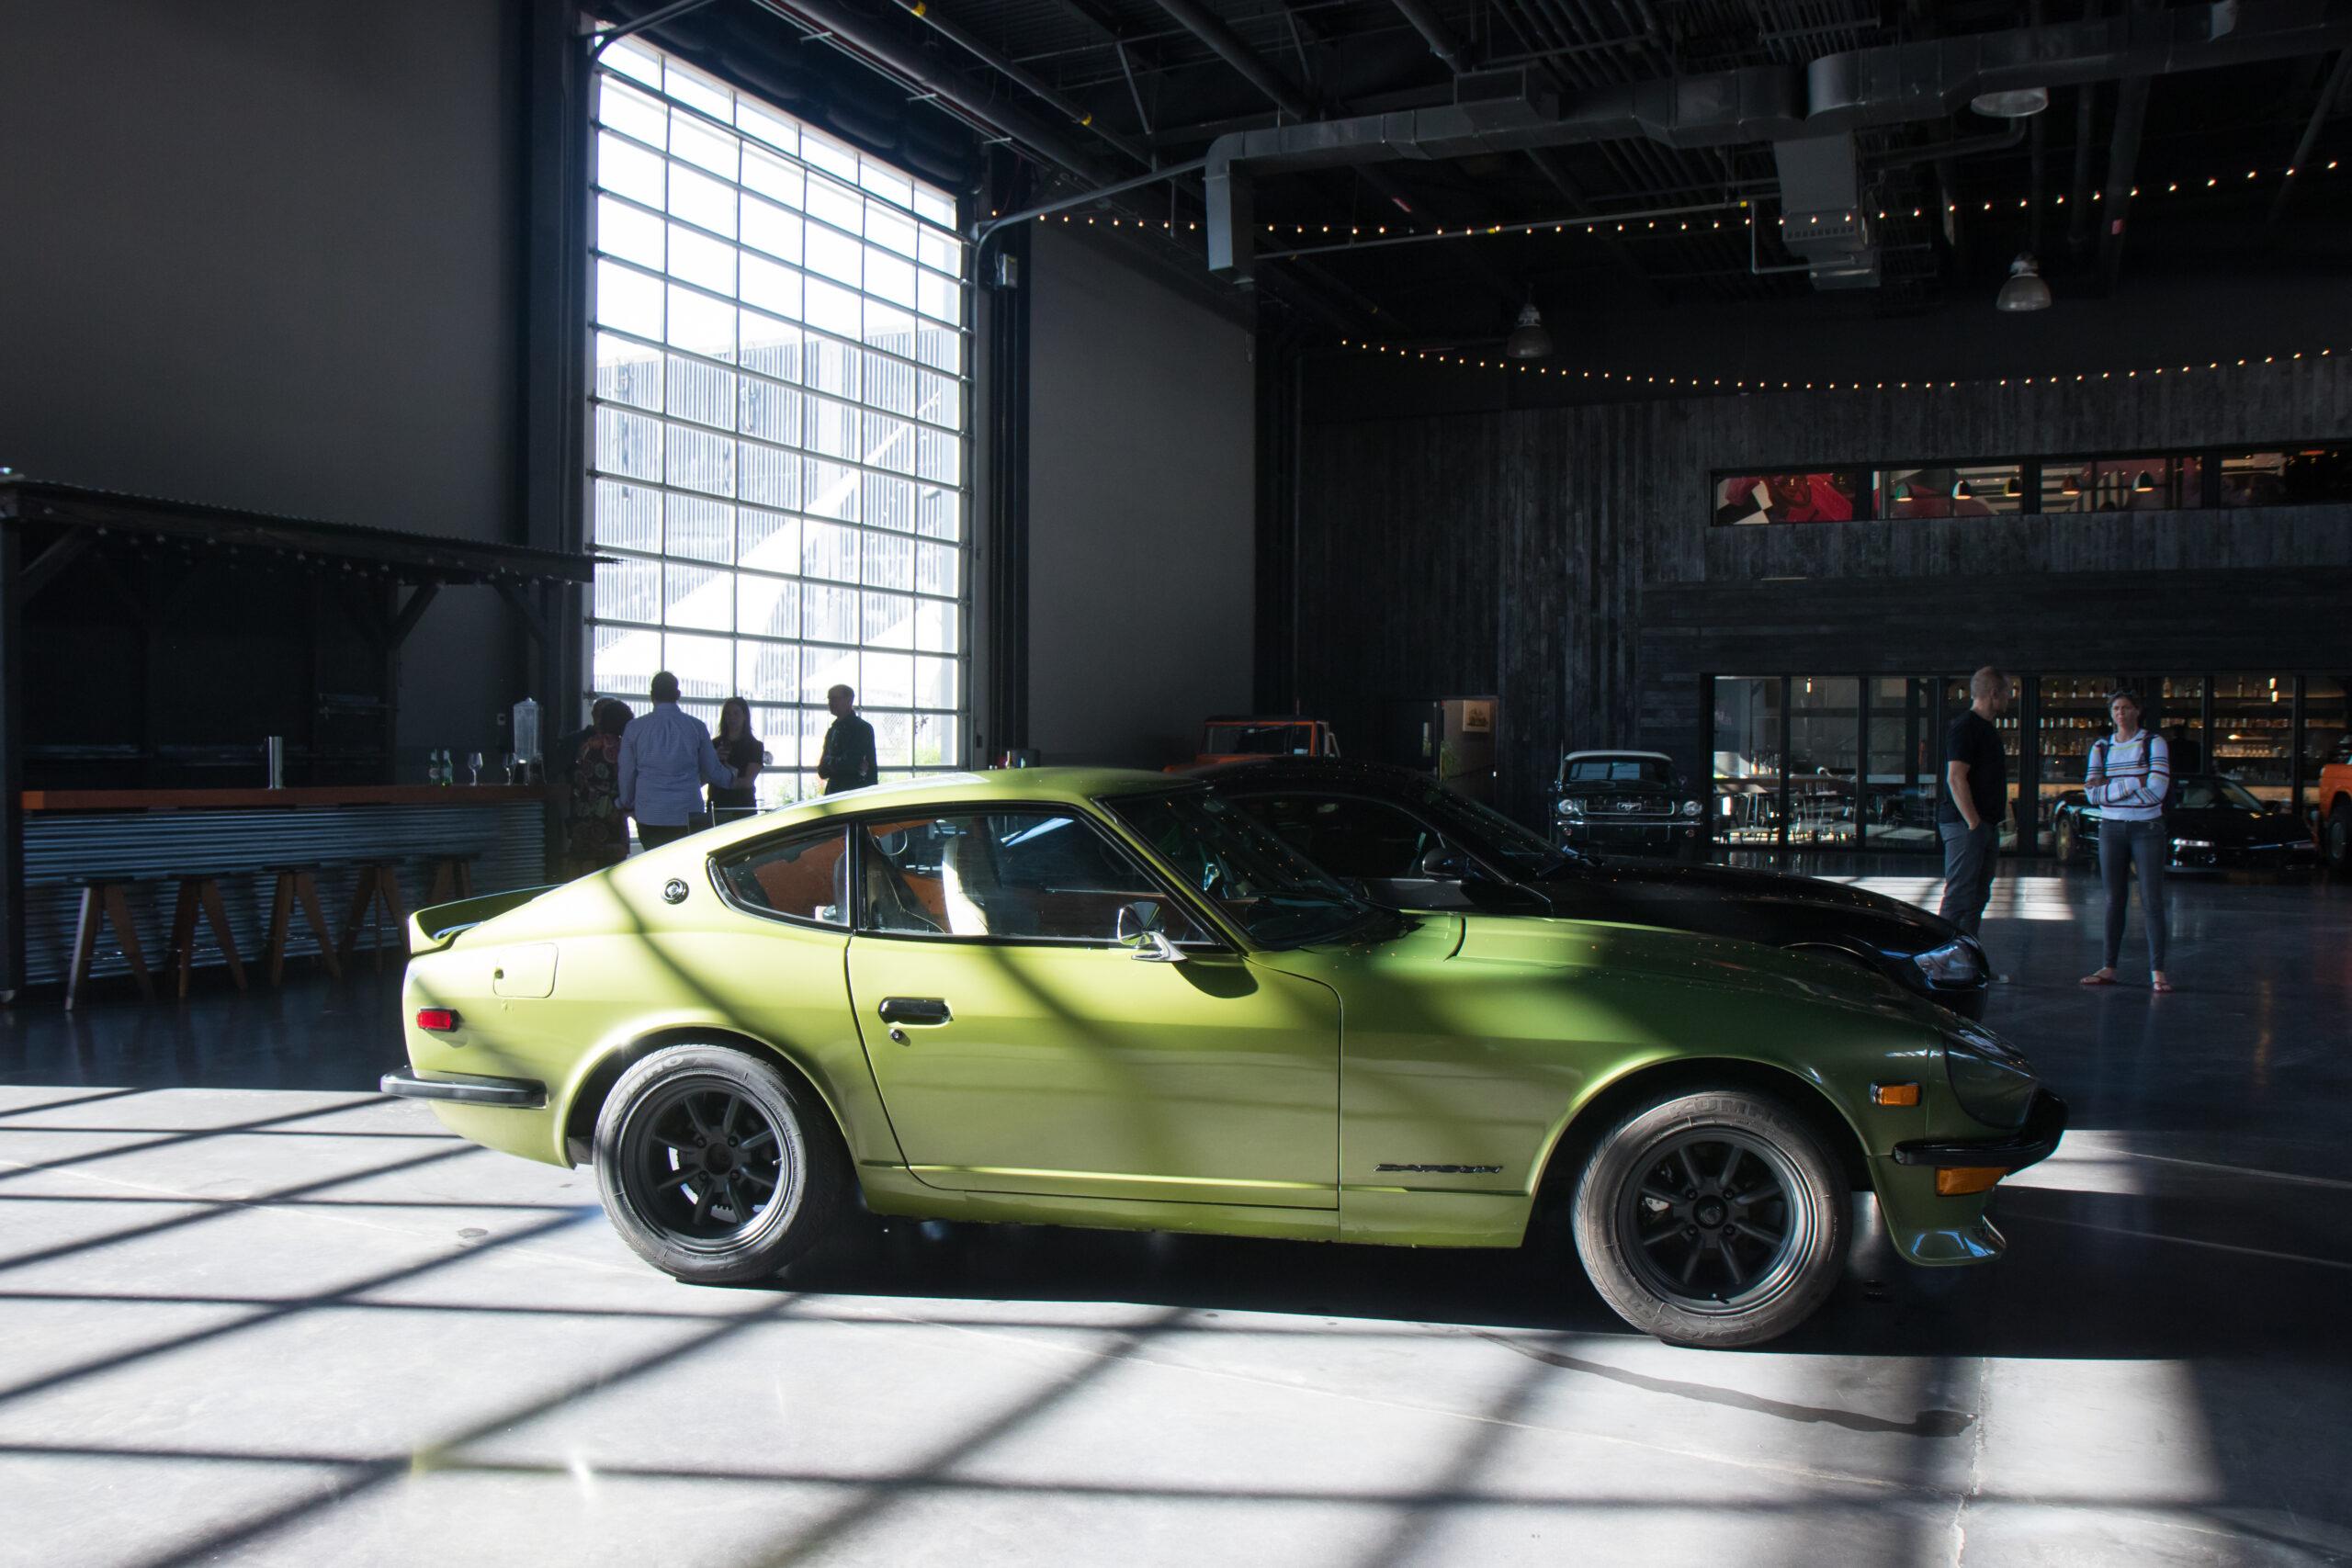 A green sports car at Classic Car Club